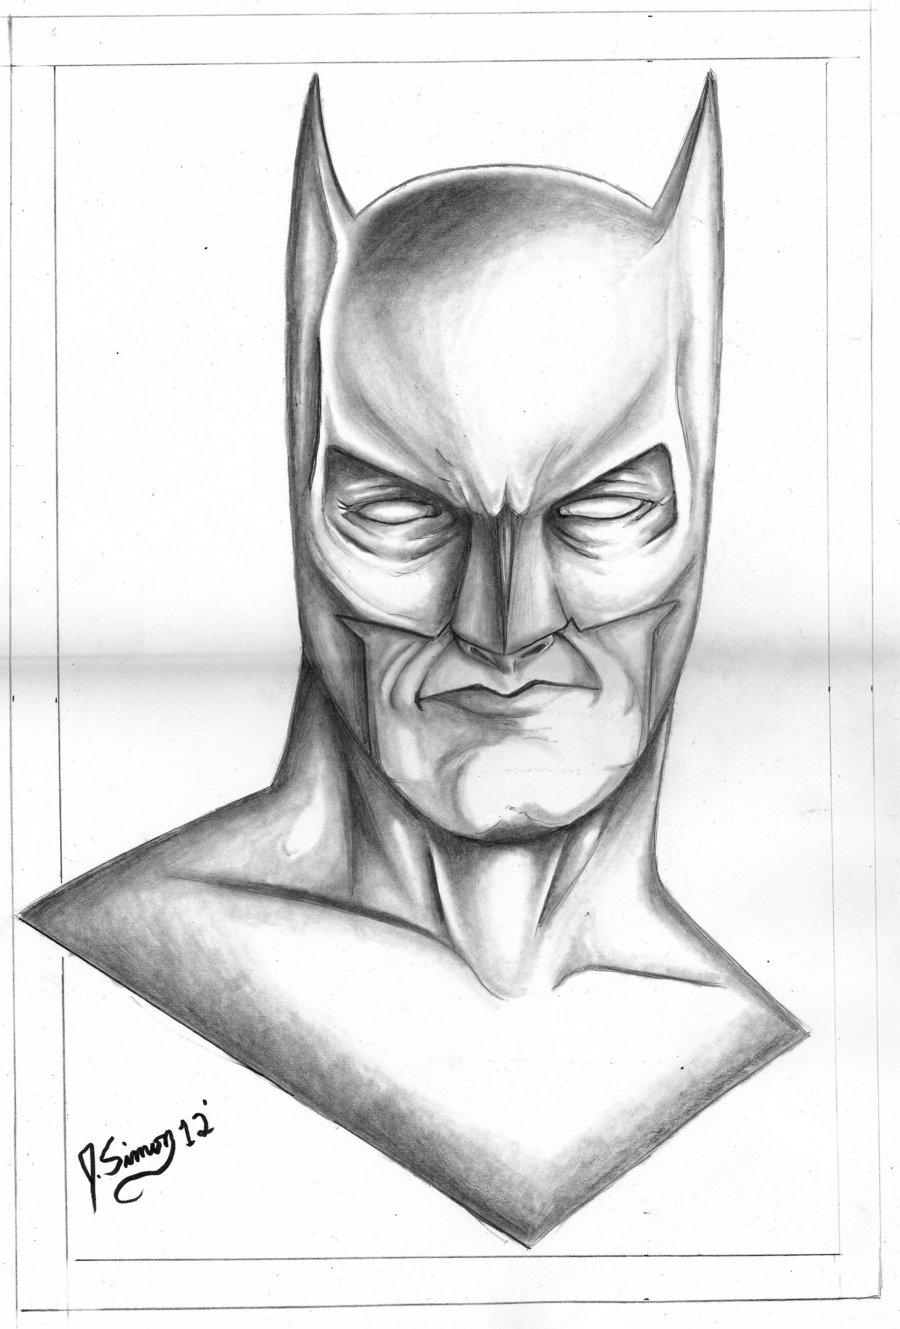 Drawn batman pencil #7